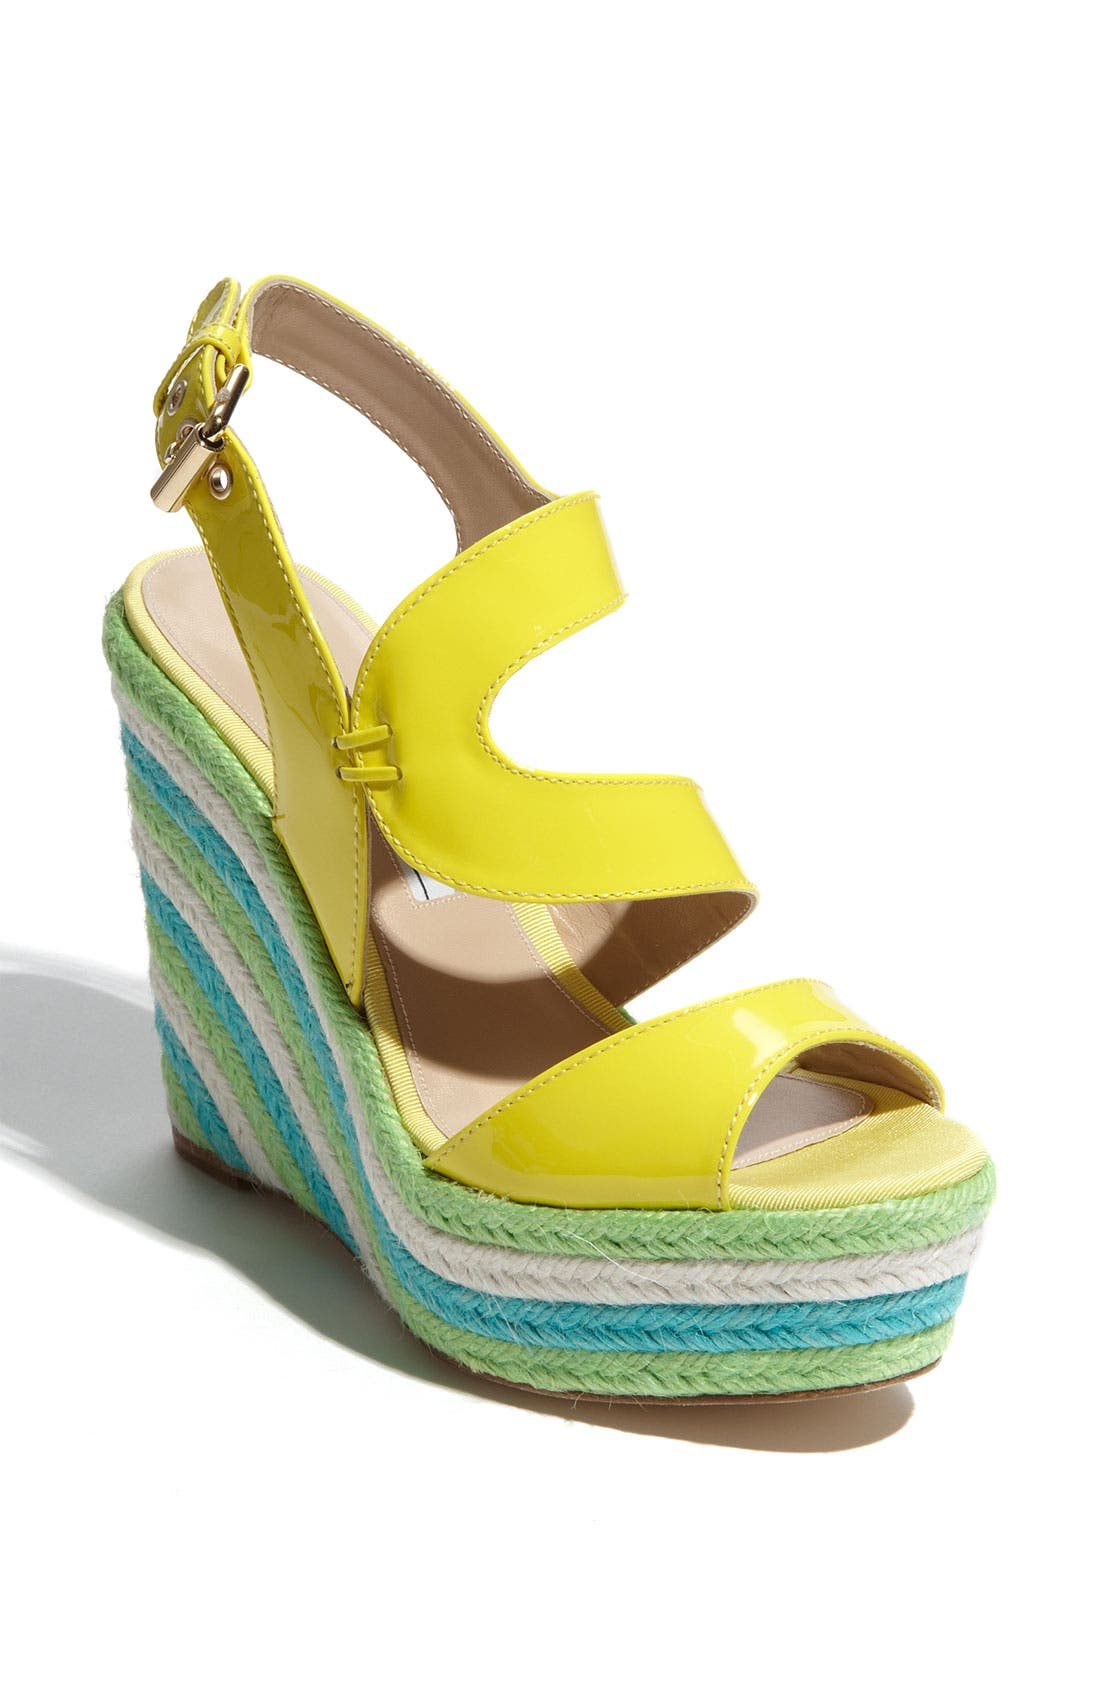 'Ariane' Espadrille Wedge Sandal,                             Main thumbnail 1, color,